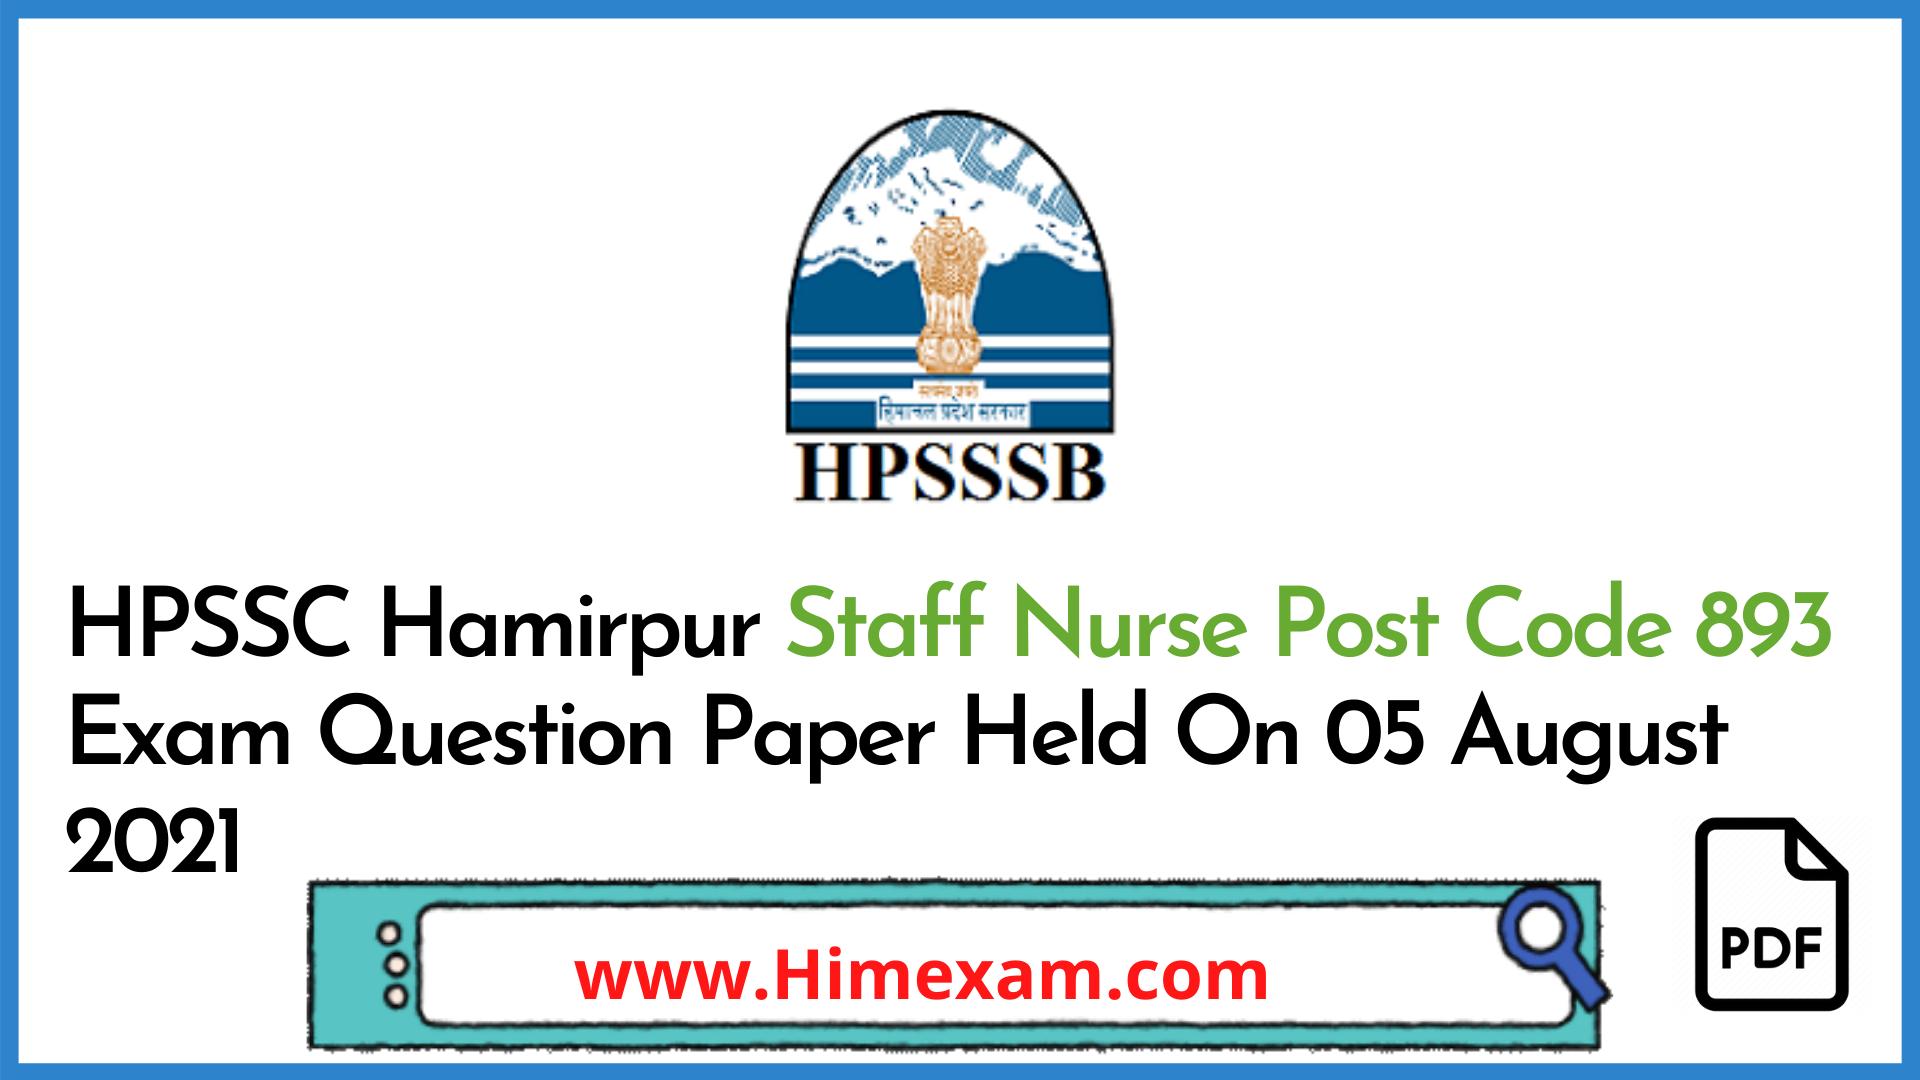 HPSSC Hamirpur Staff Nurse Post Code 893 Exam Question Paper Held On 05 August 2021